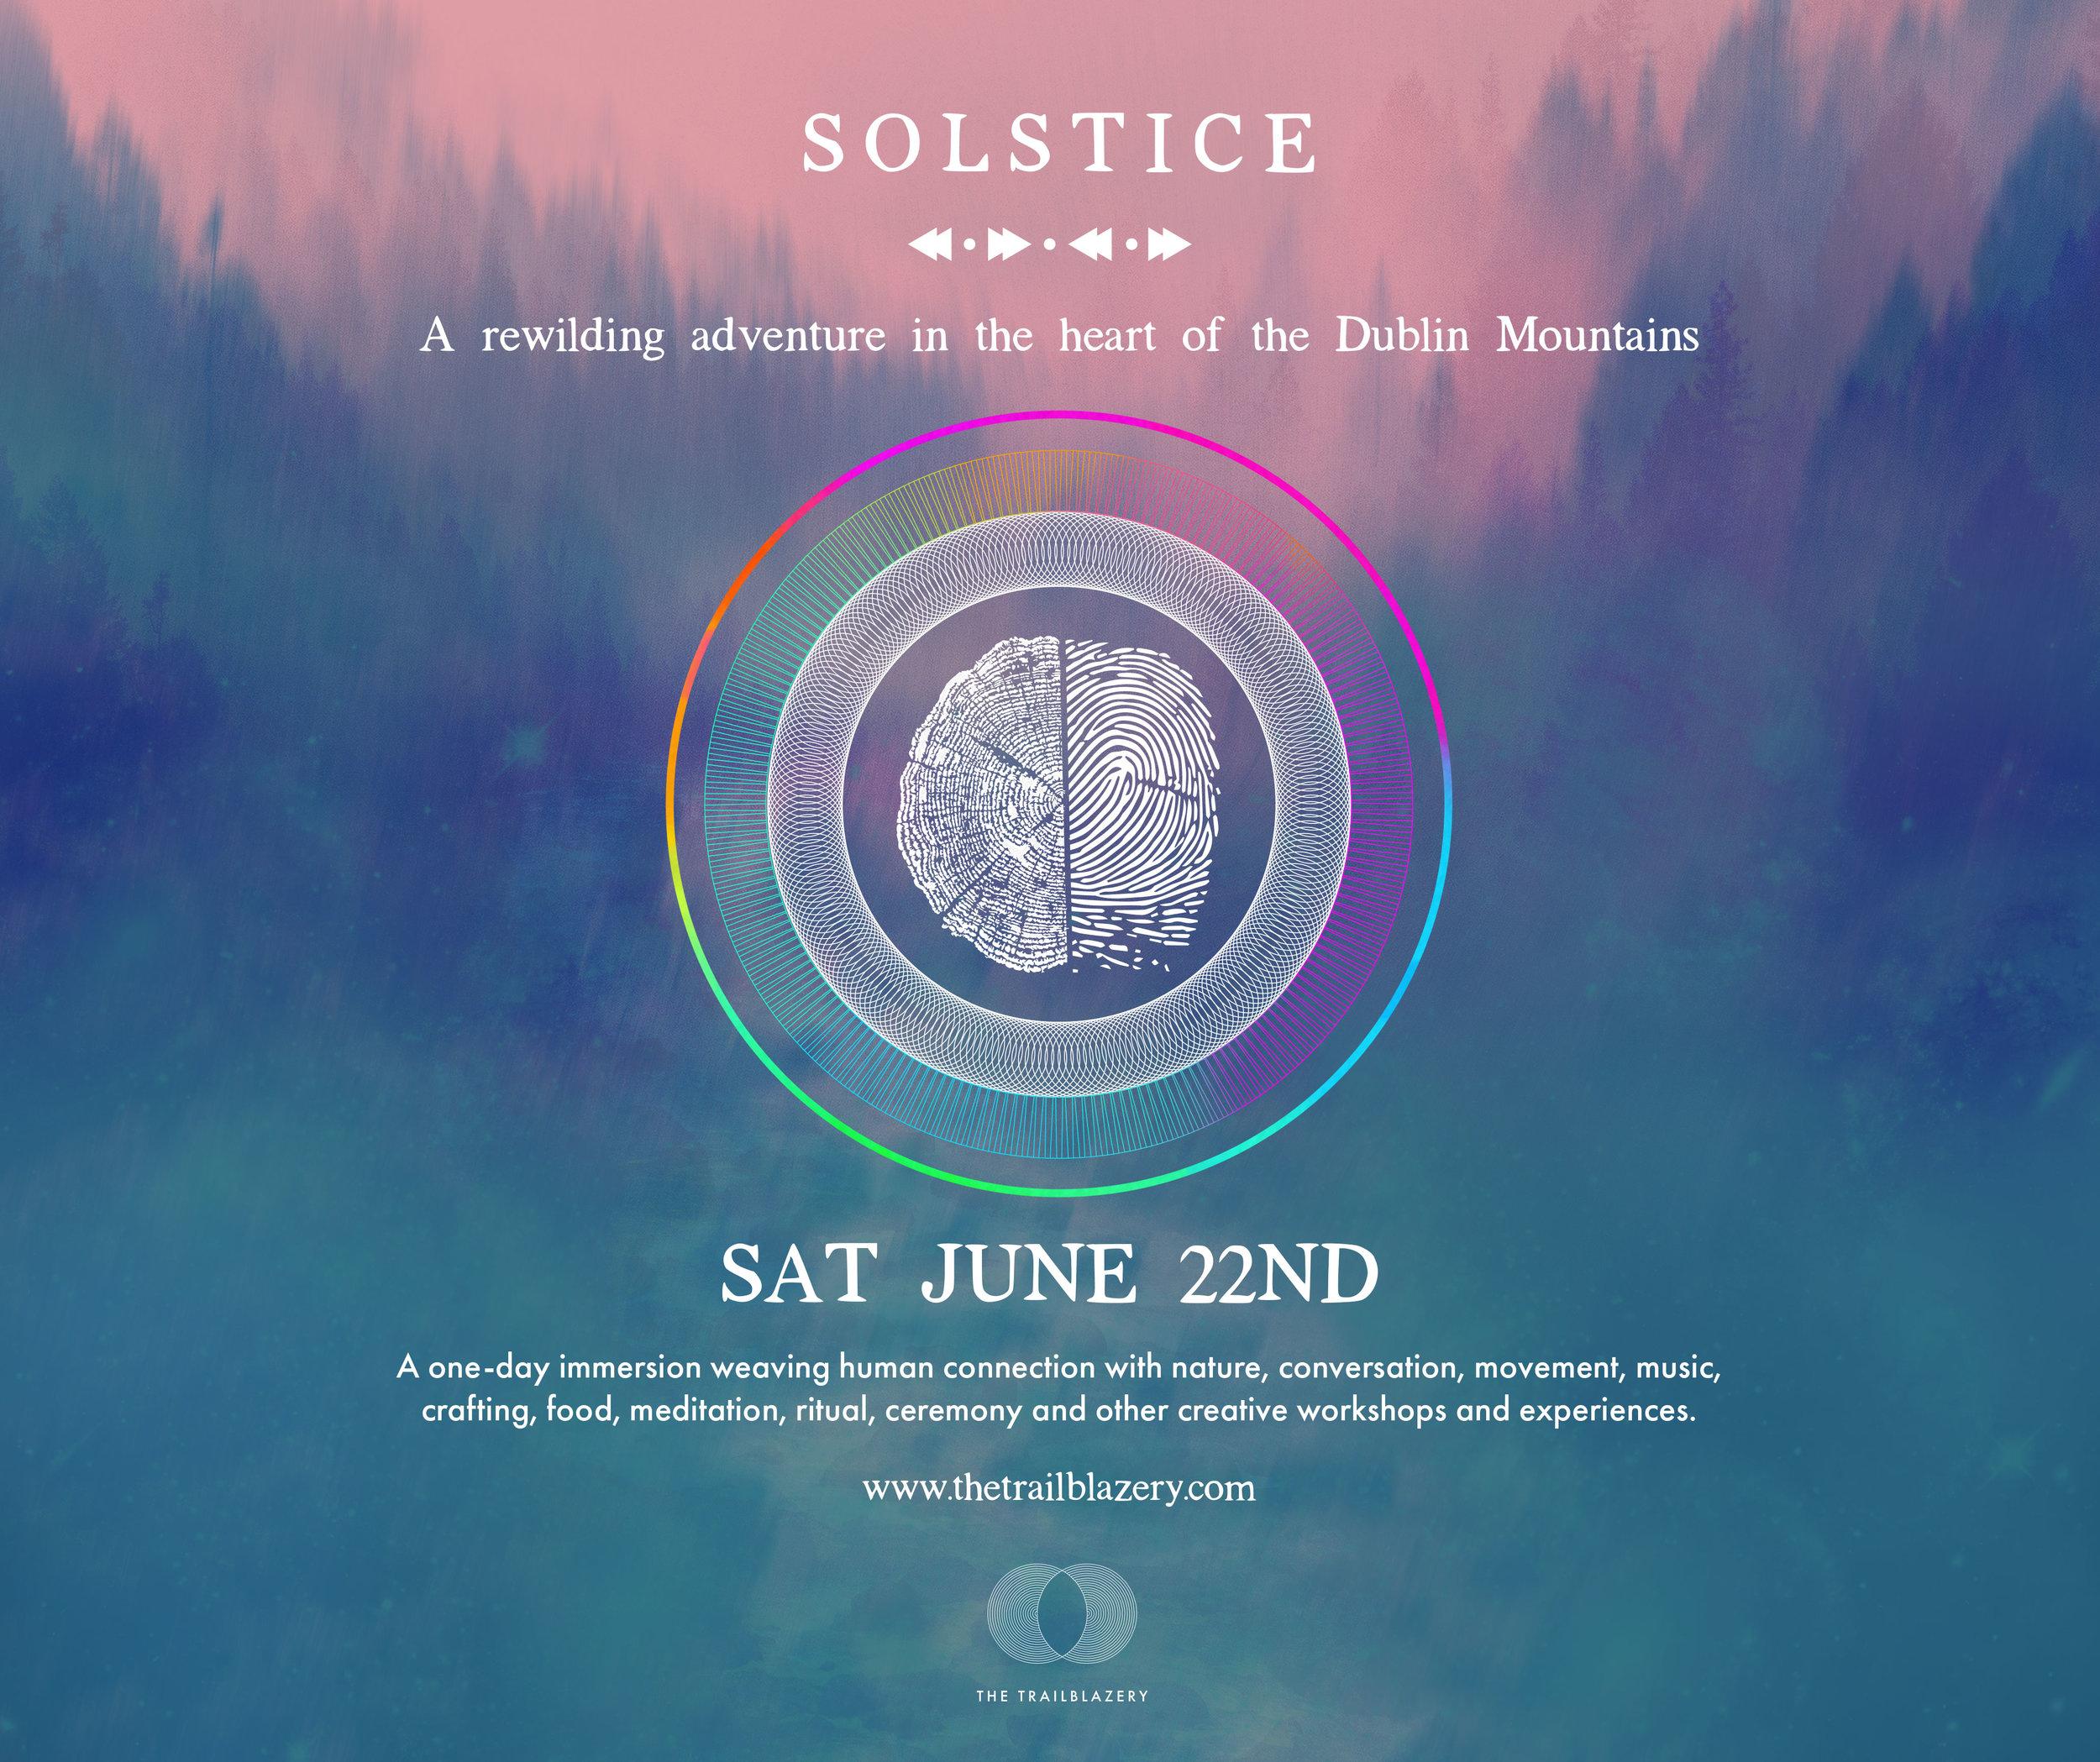 solstice-final copy.jpg